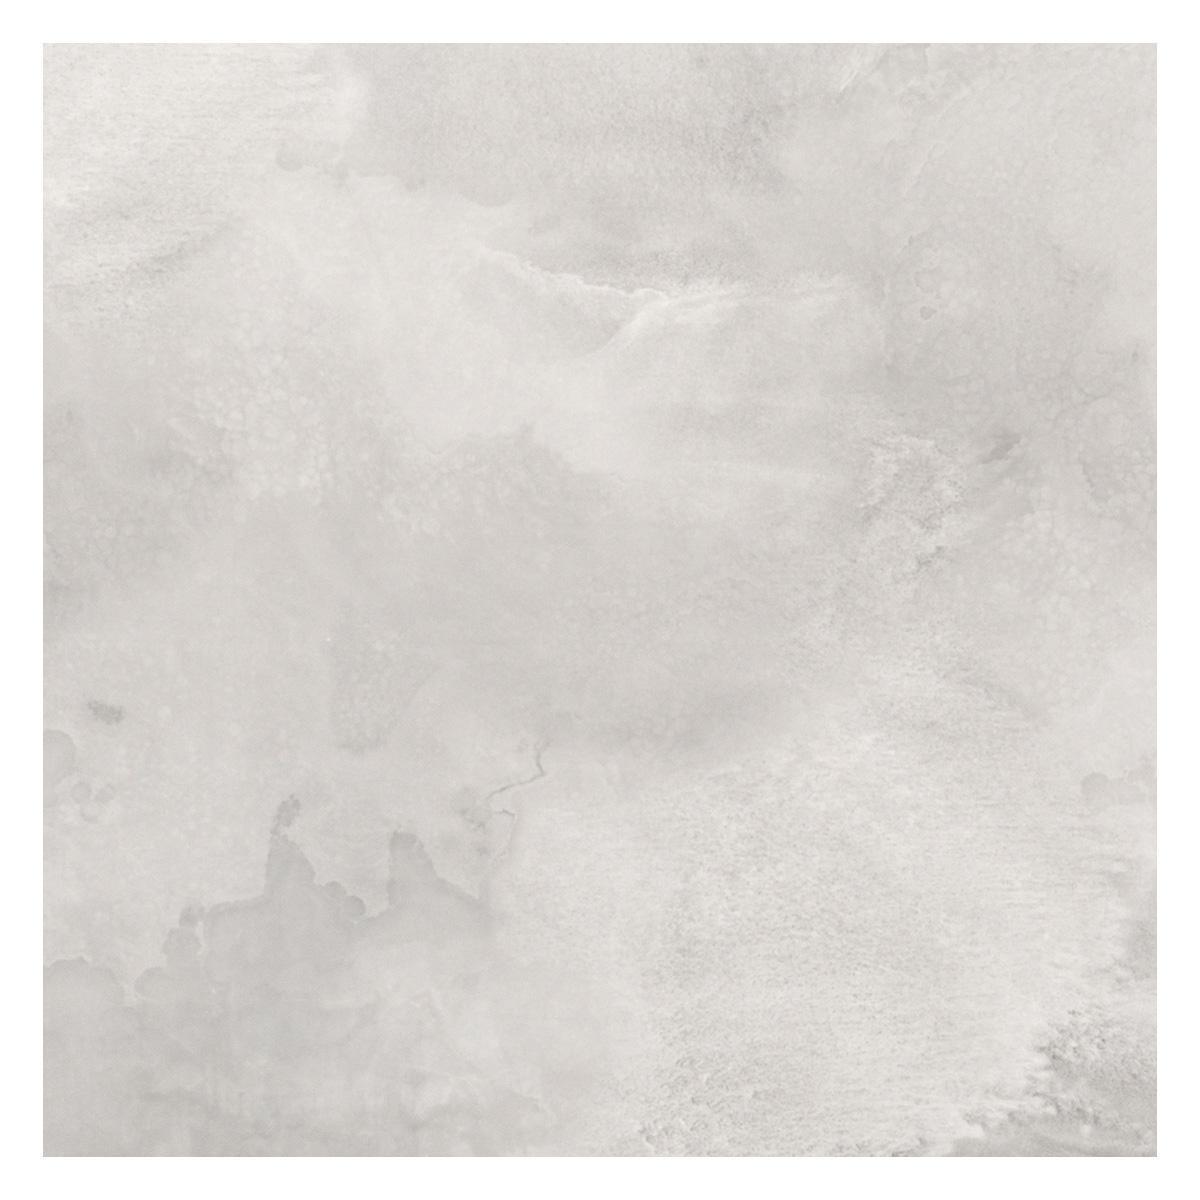 Porcelanato Cemento Gris Brillante - 60X60 cm - 1.44 m2